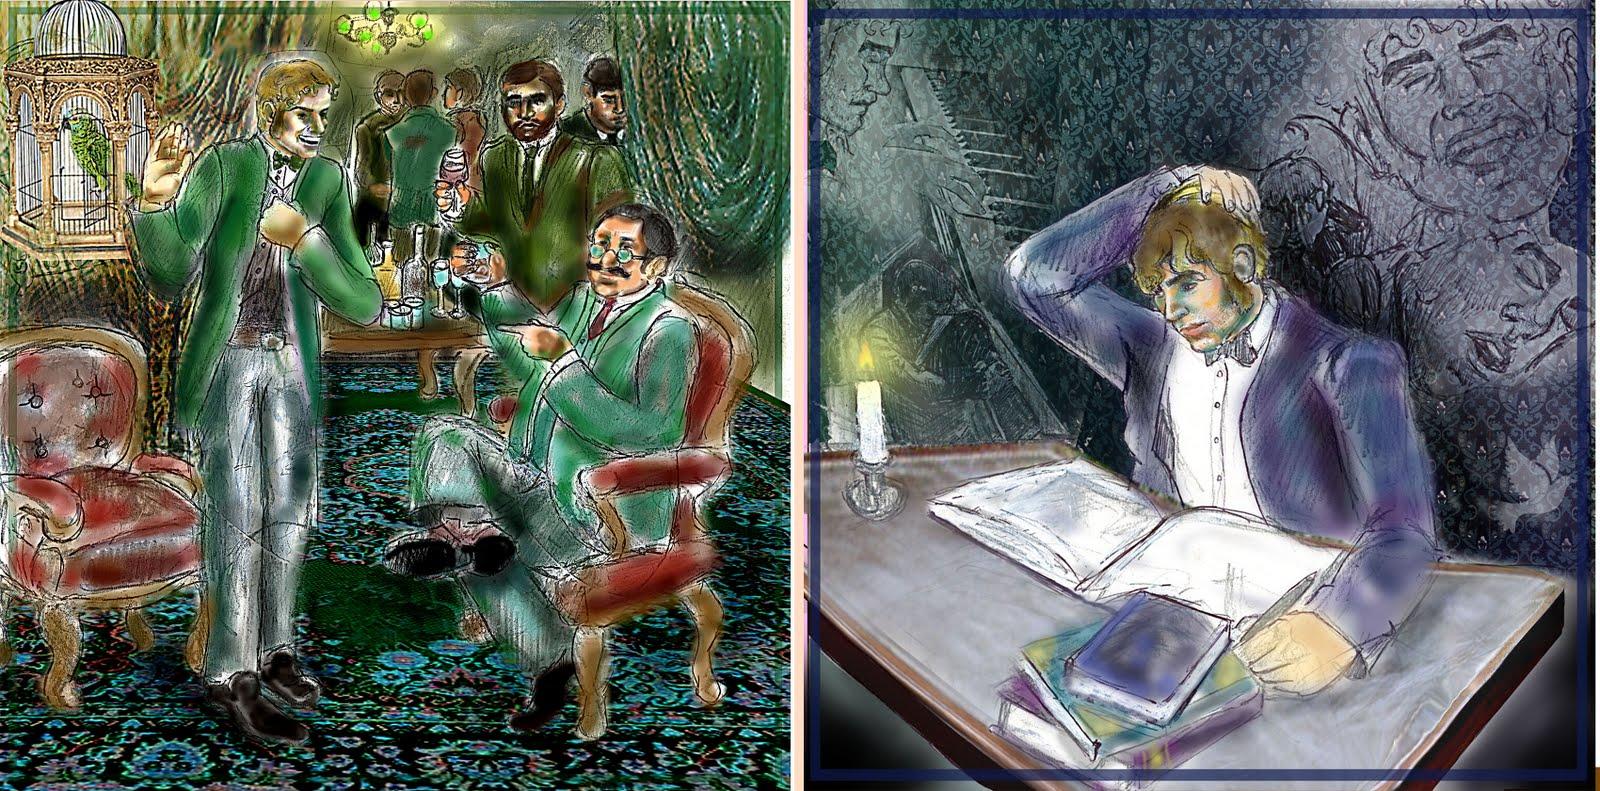 short story bet anton chekhov won bet banker lawyer